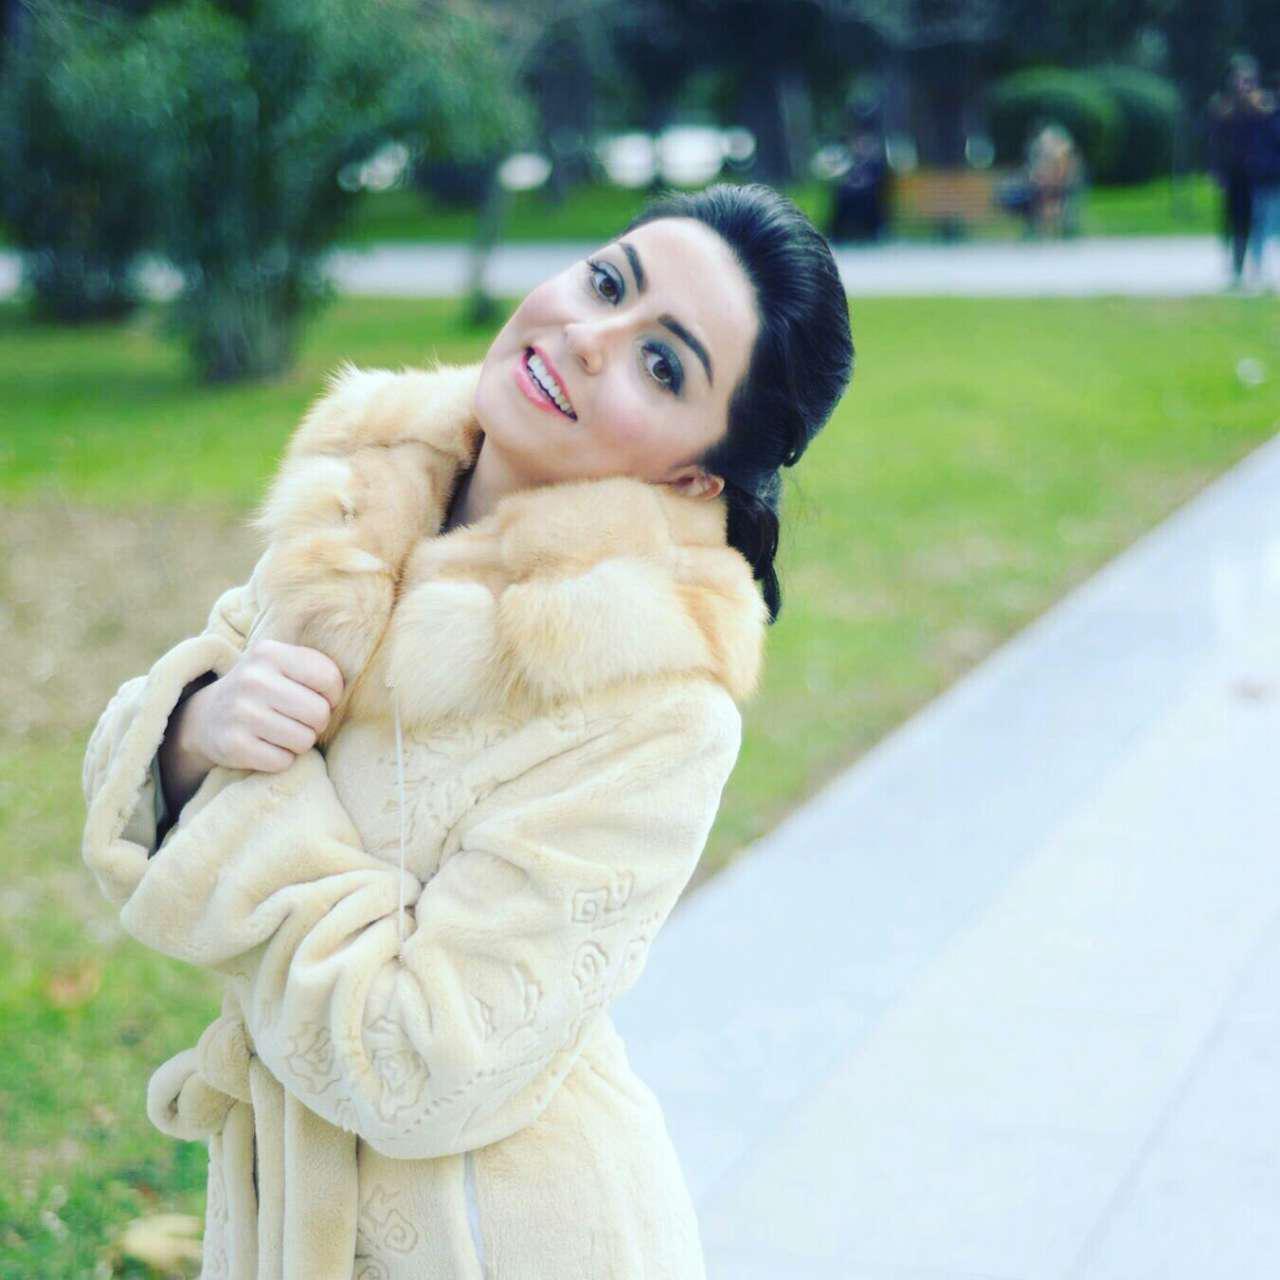 دانلود آهنگafet-fermanqizi-ureyimin-sahibi-va-2017